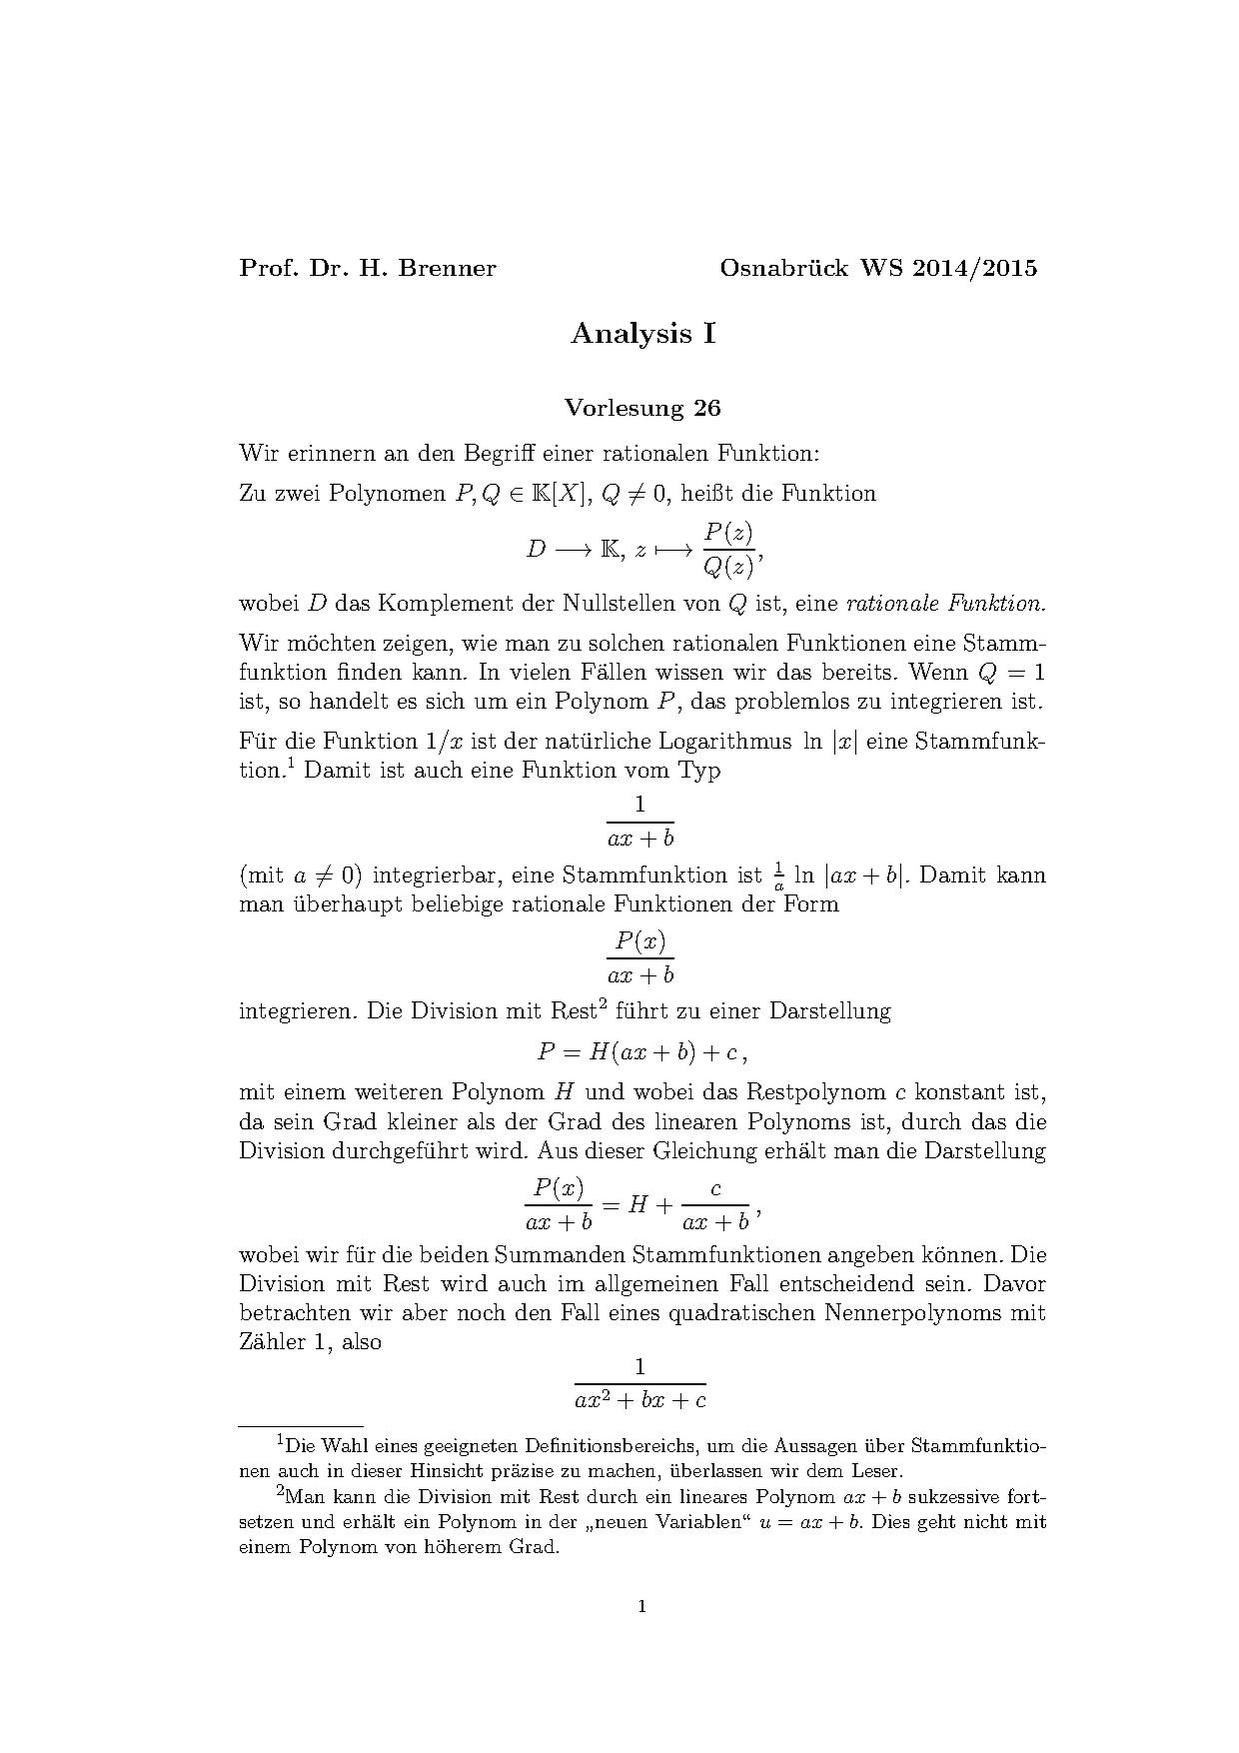 File:Analysis (Osnabrück 2014-2016)Vorlesung26.pdf - Wikimedia Commons